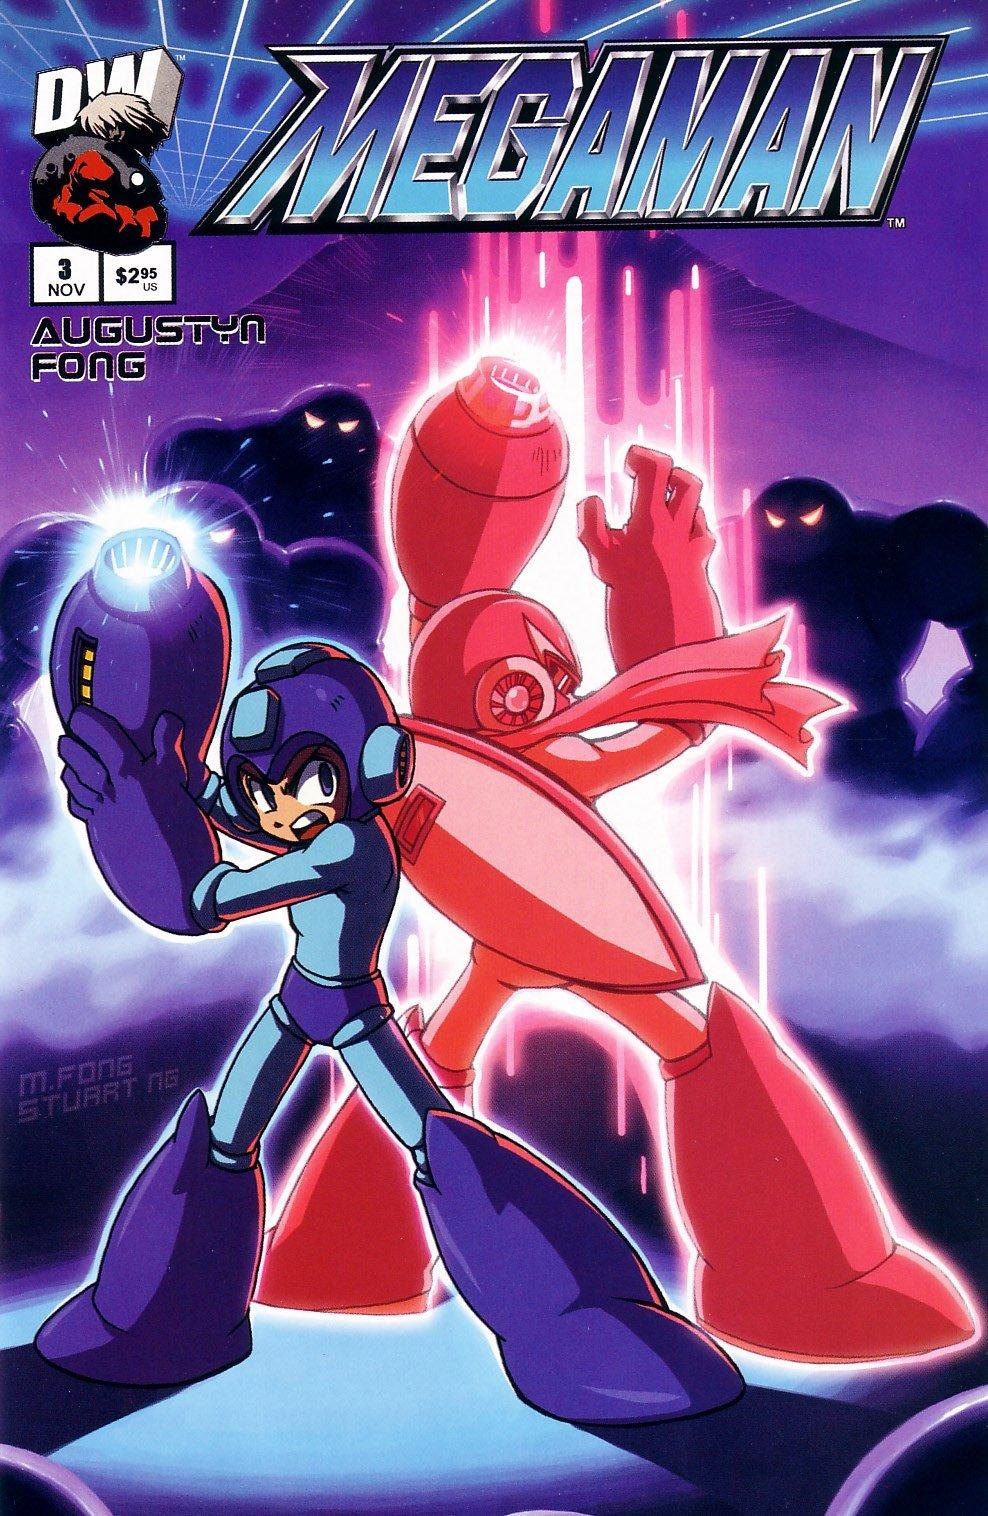 Mega Man 03 (November 2003)